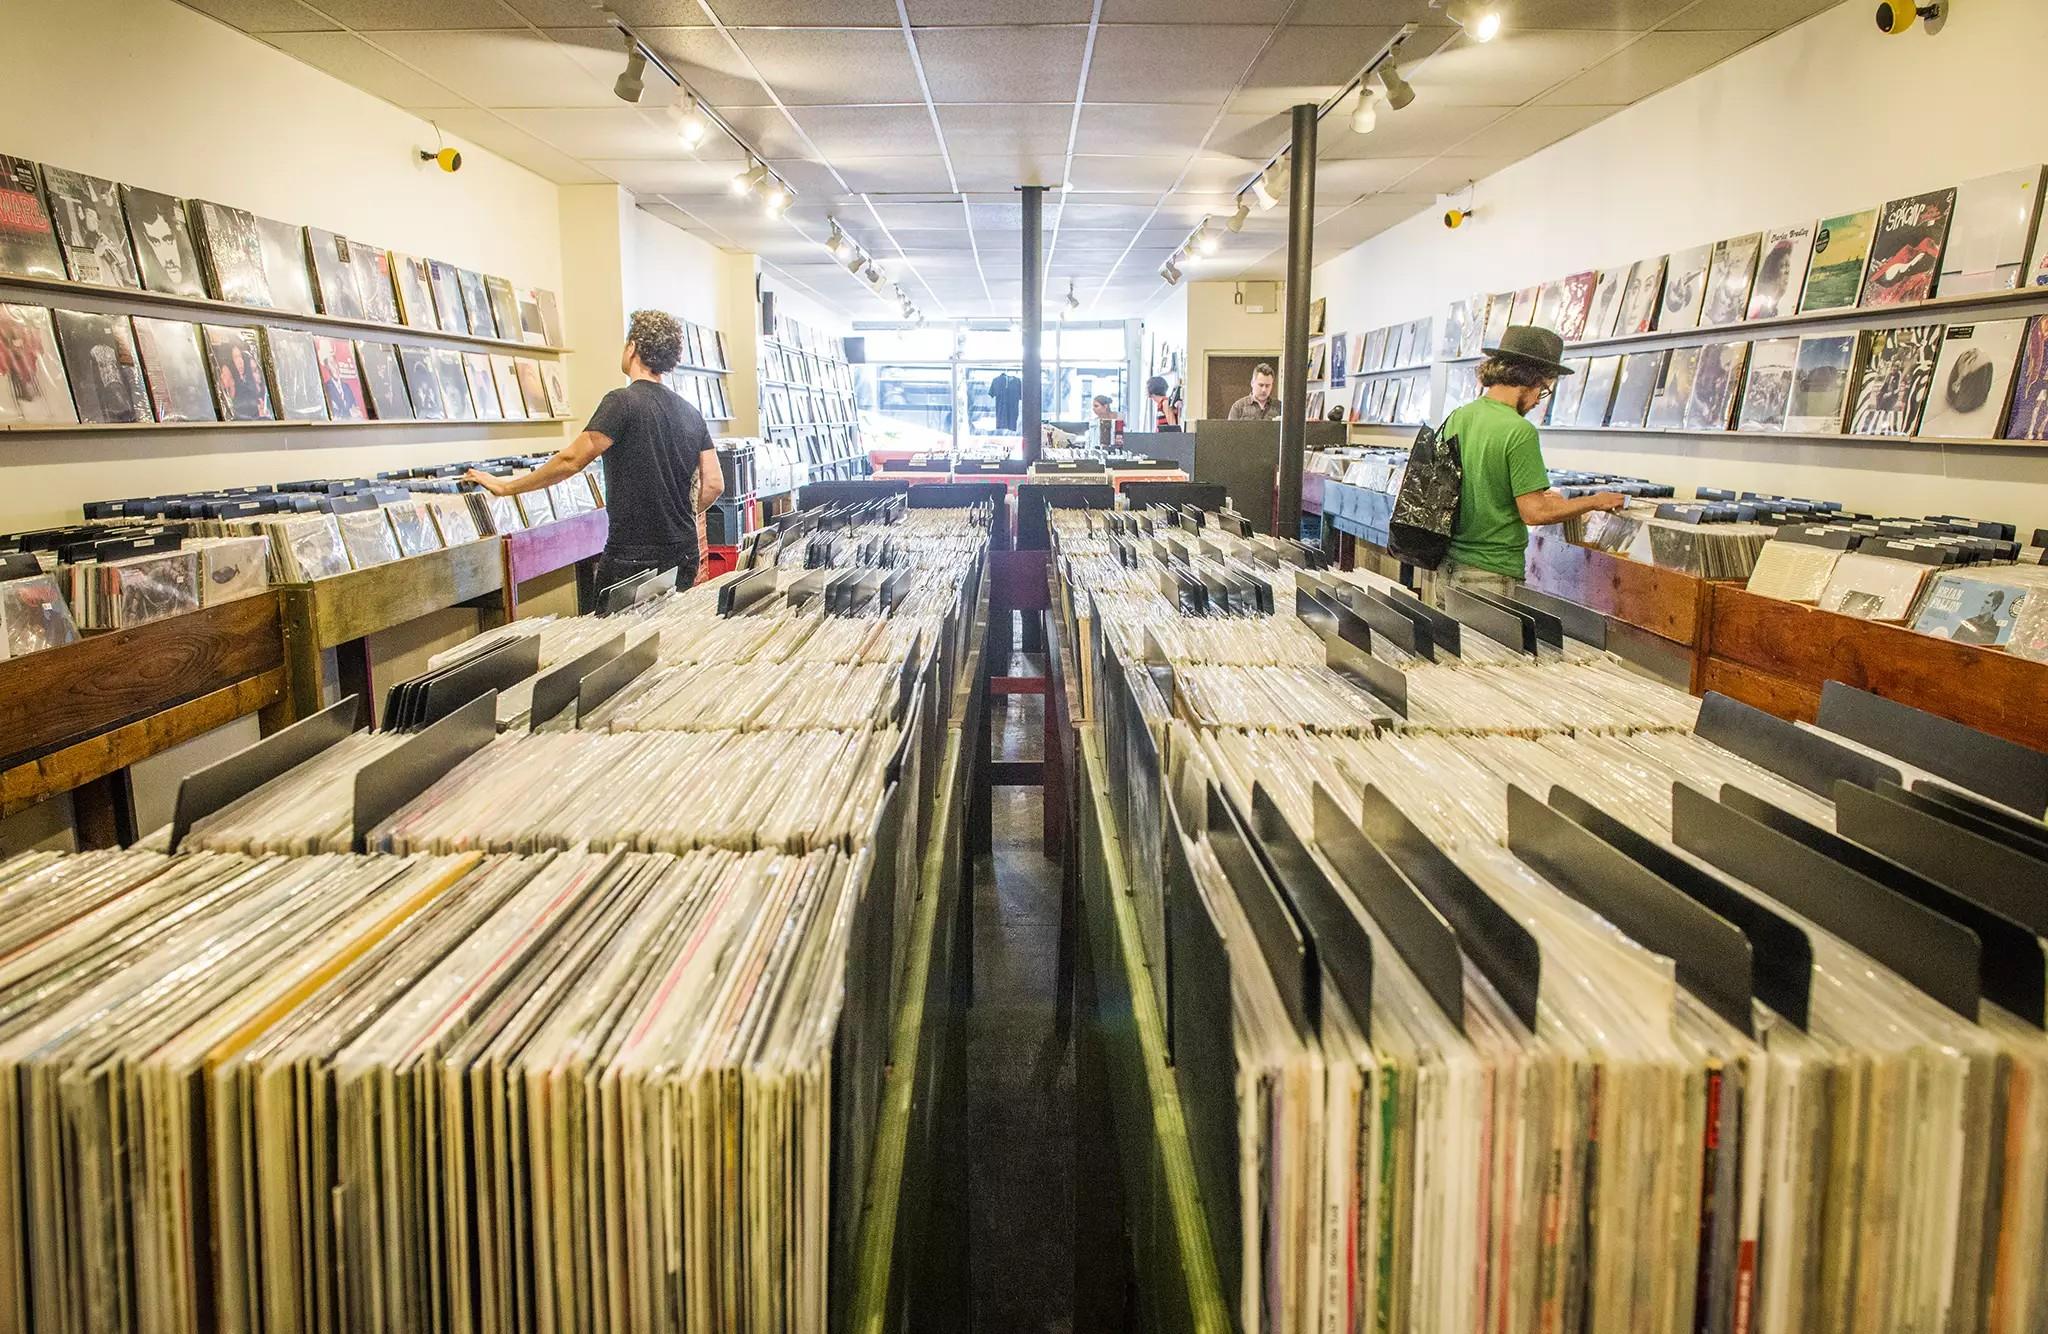 Venta de discos cae a niveles históricos en Estados Unidos